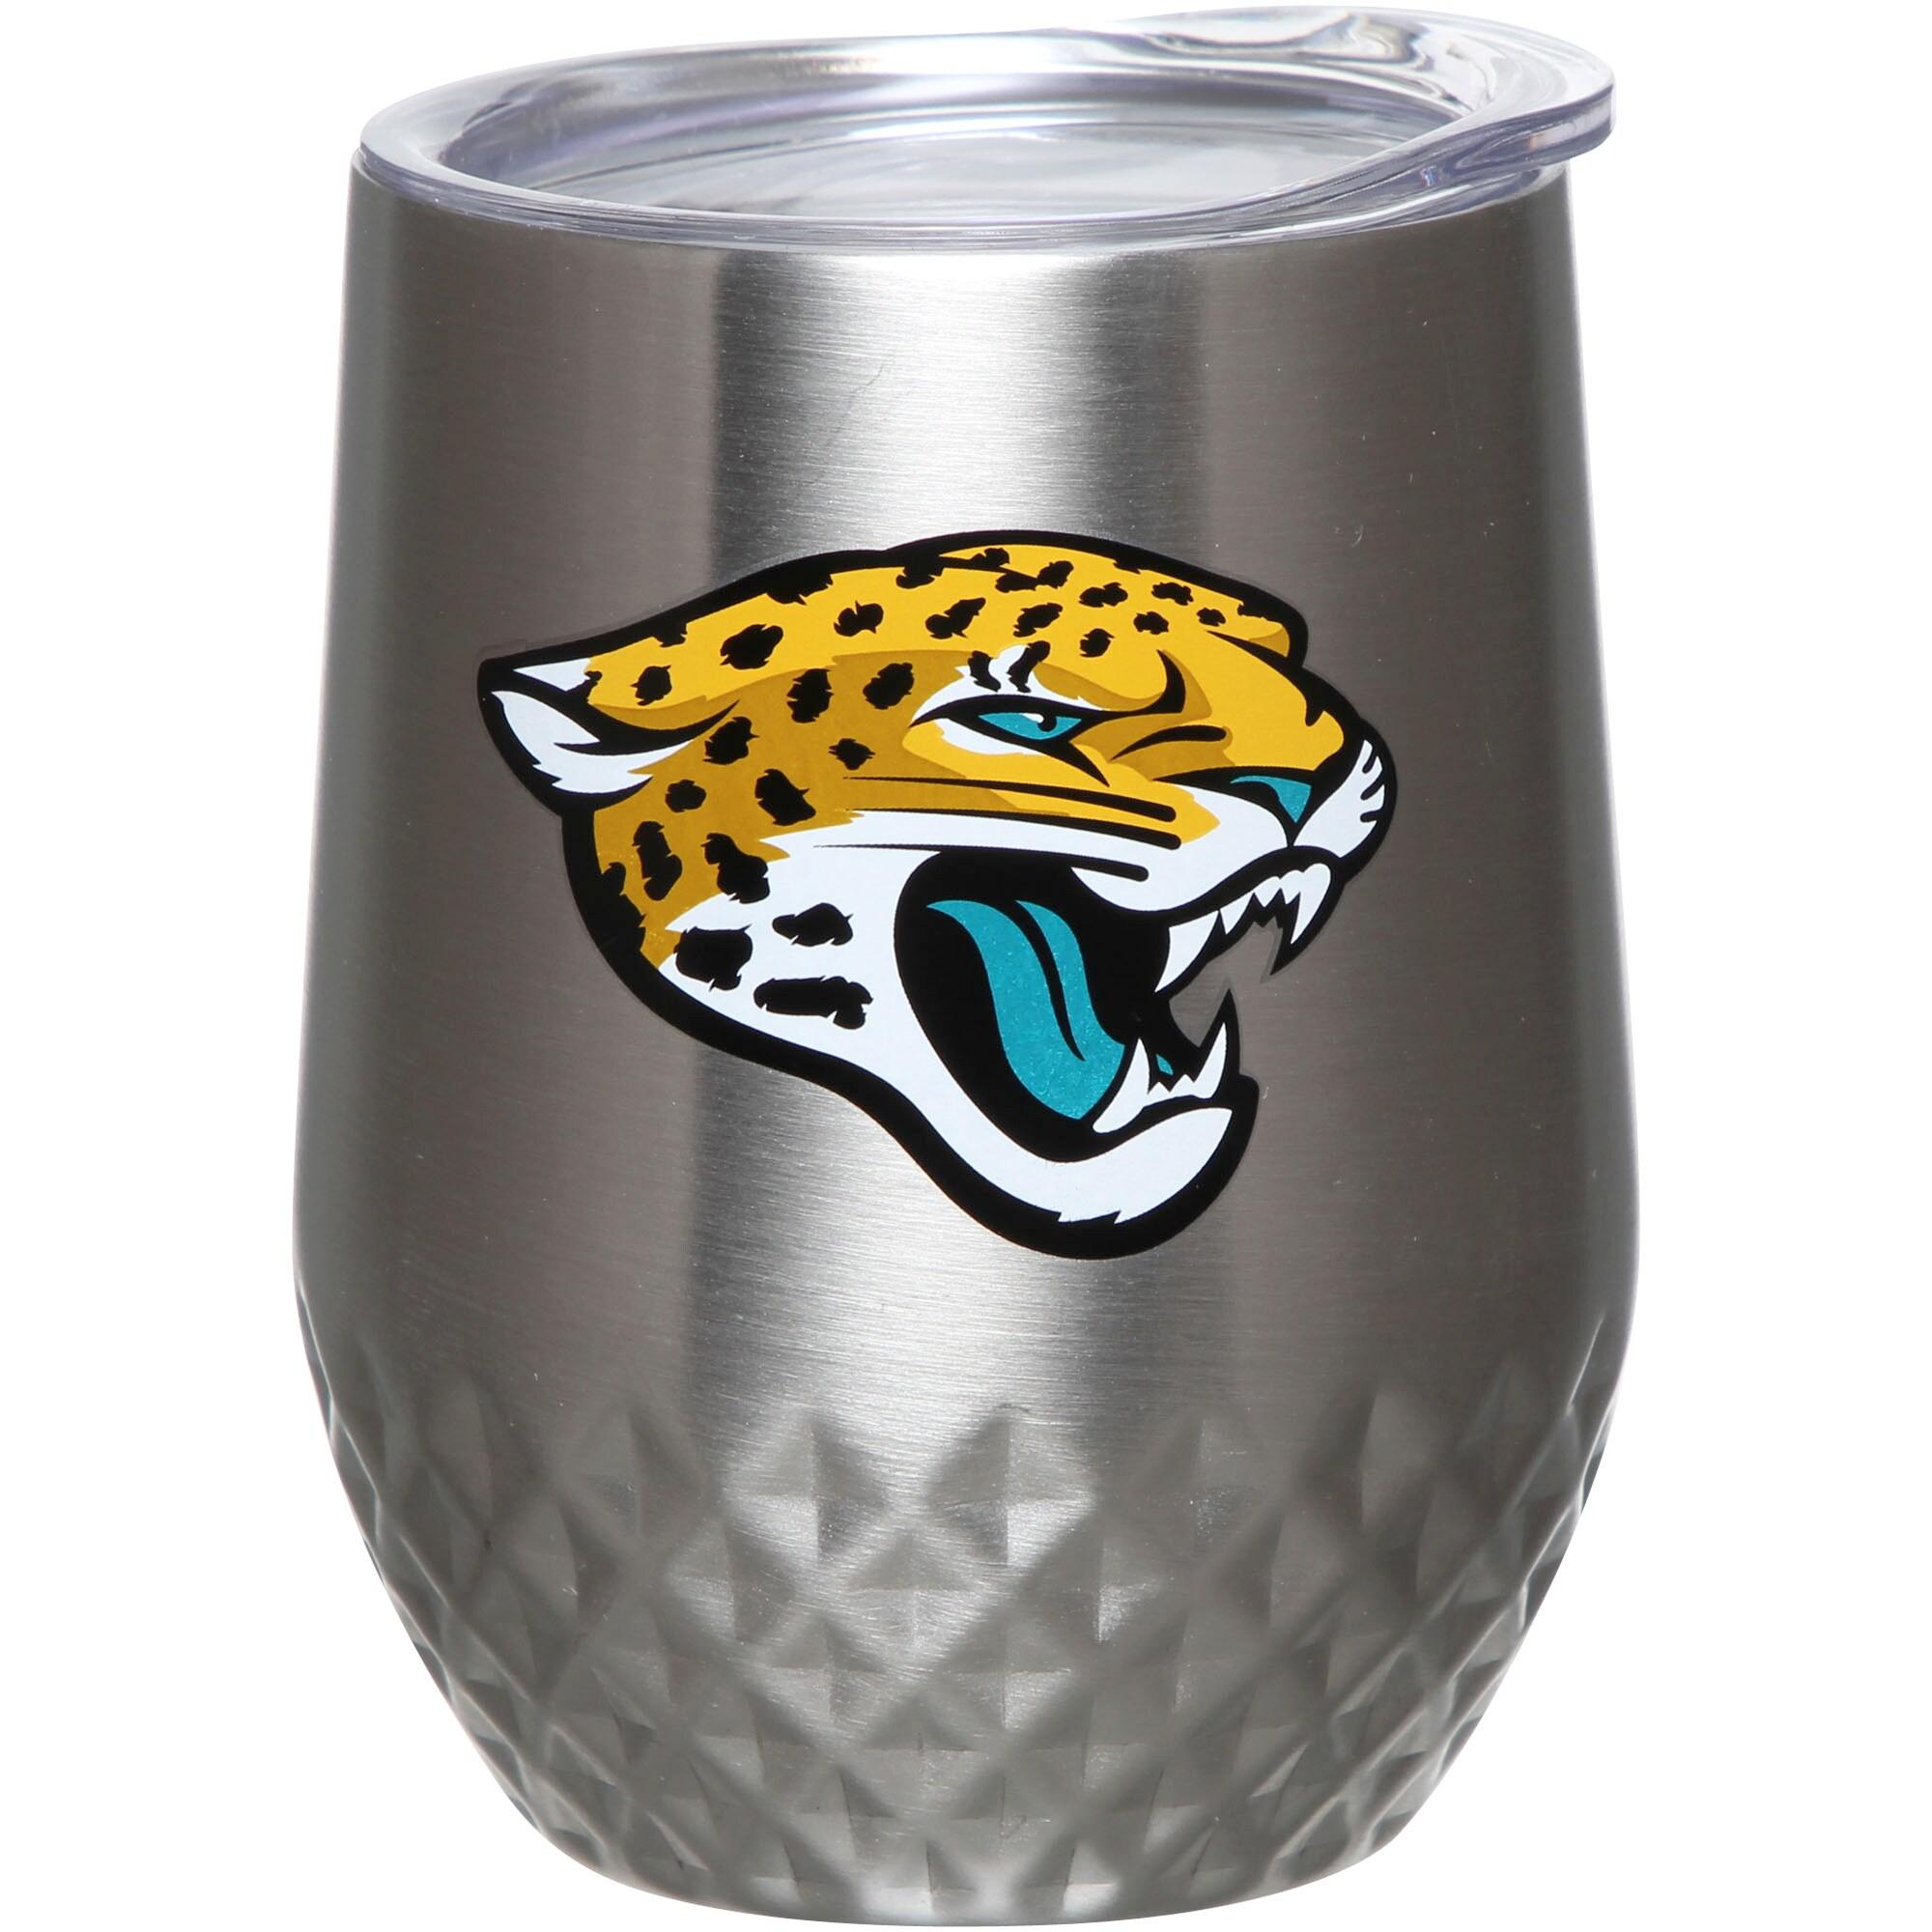 Jacksonville Jaguars 12oz. Stainless Steel Stemless Diamond Tumbler